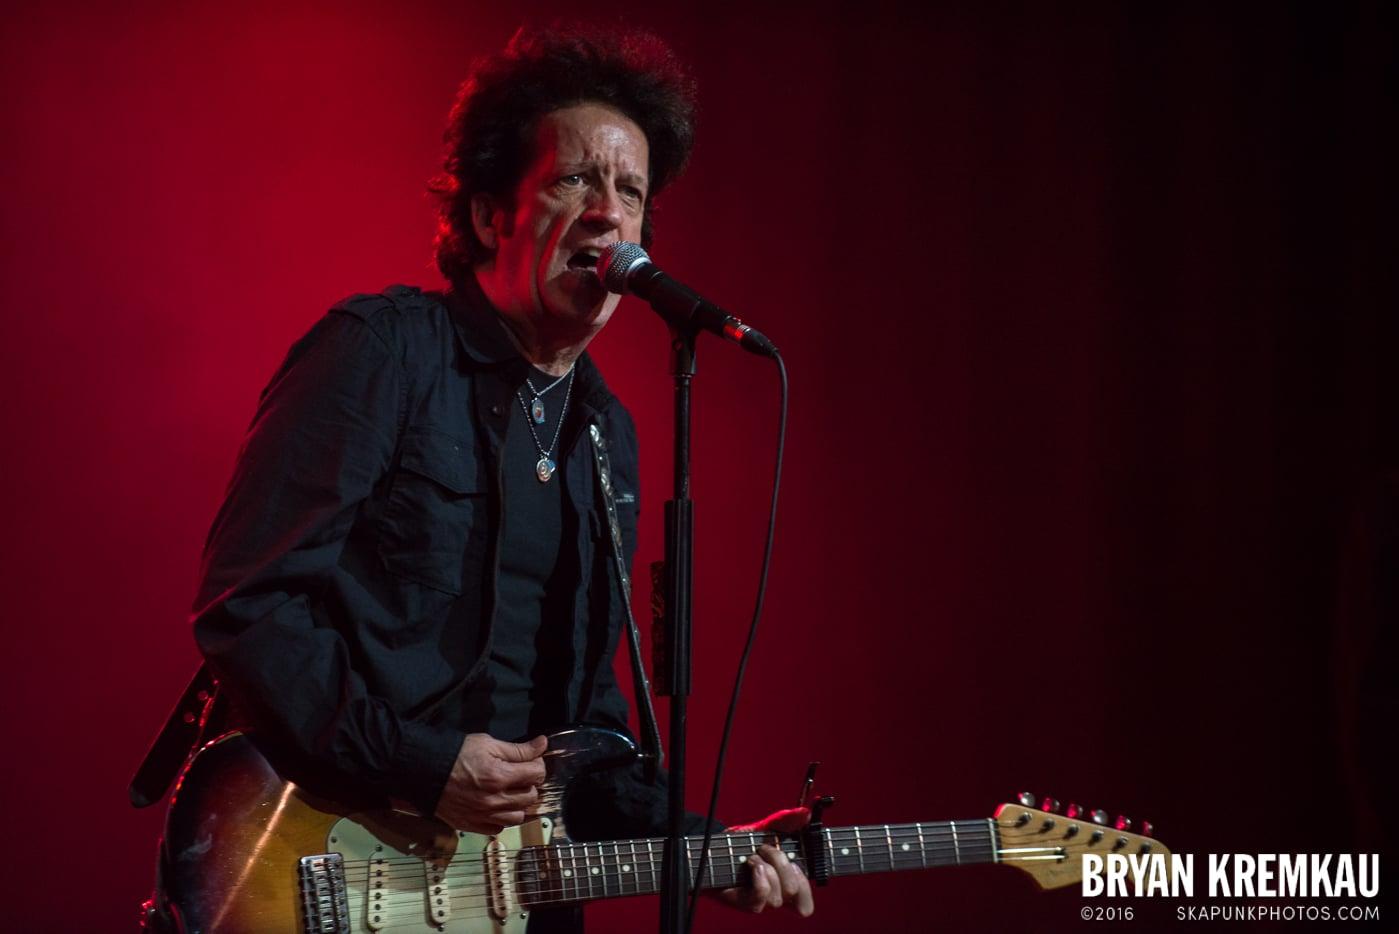 Willie Nile @ Highline Ballroom, NYC - 12.26.14 (77)